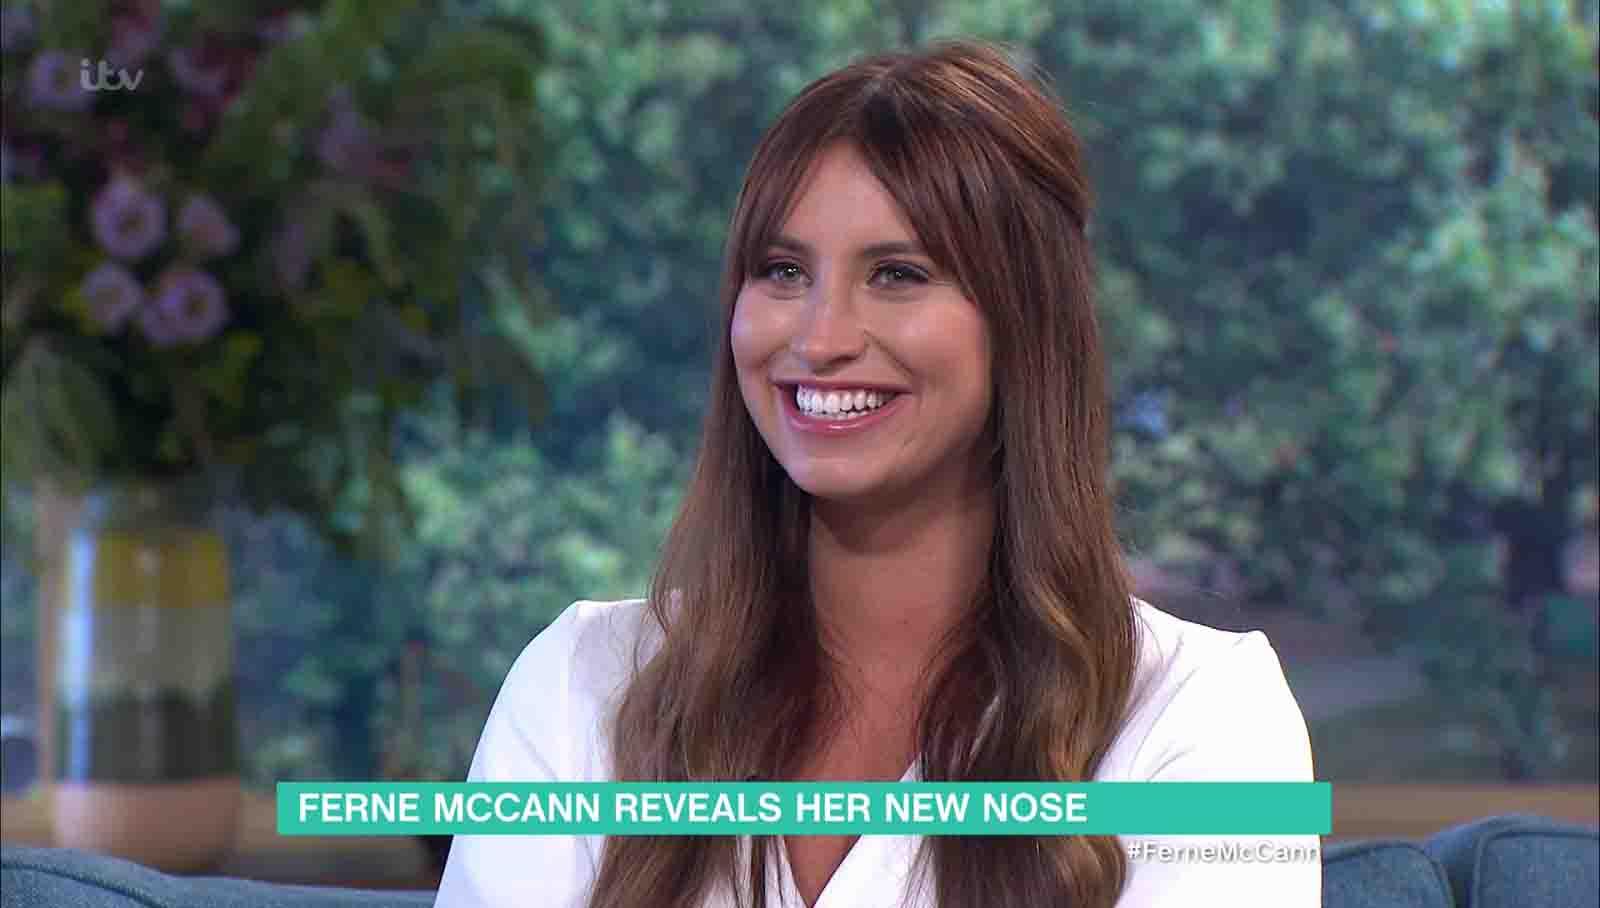 Ferne-McCann-This-Morning-Nose